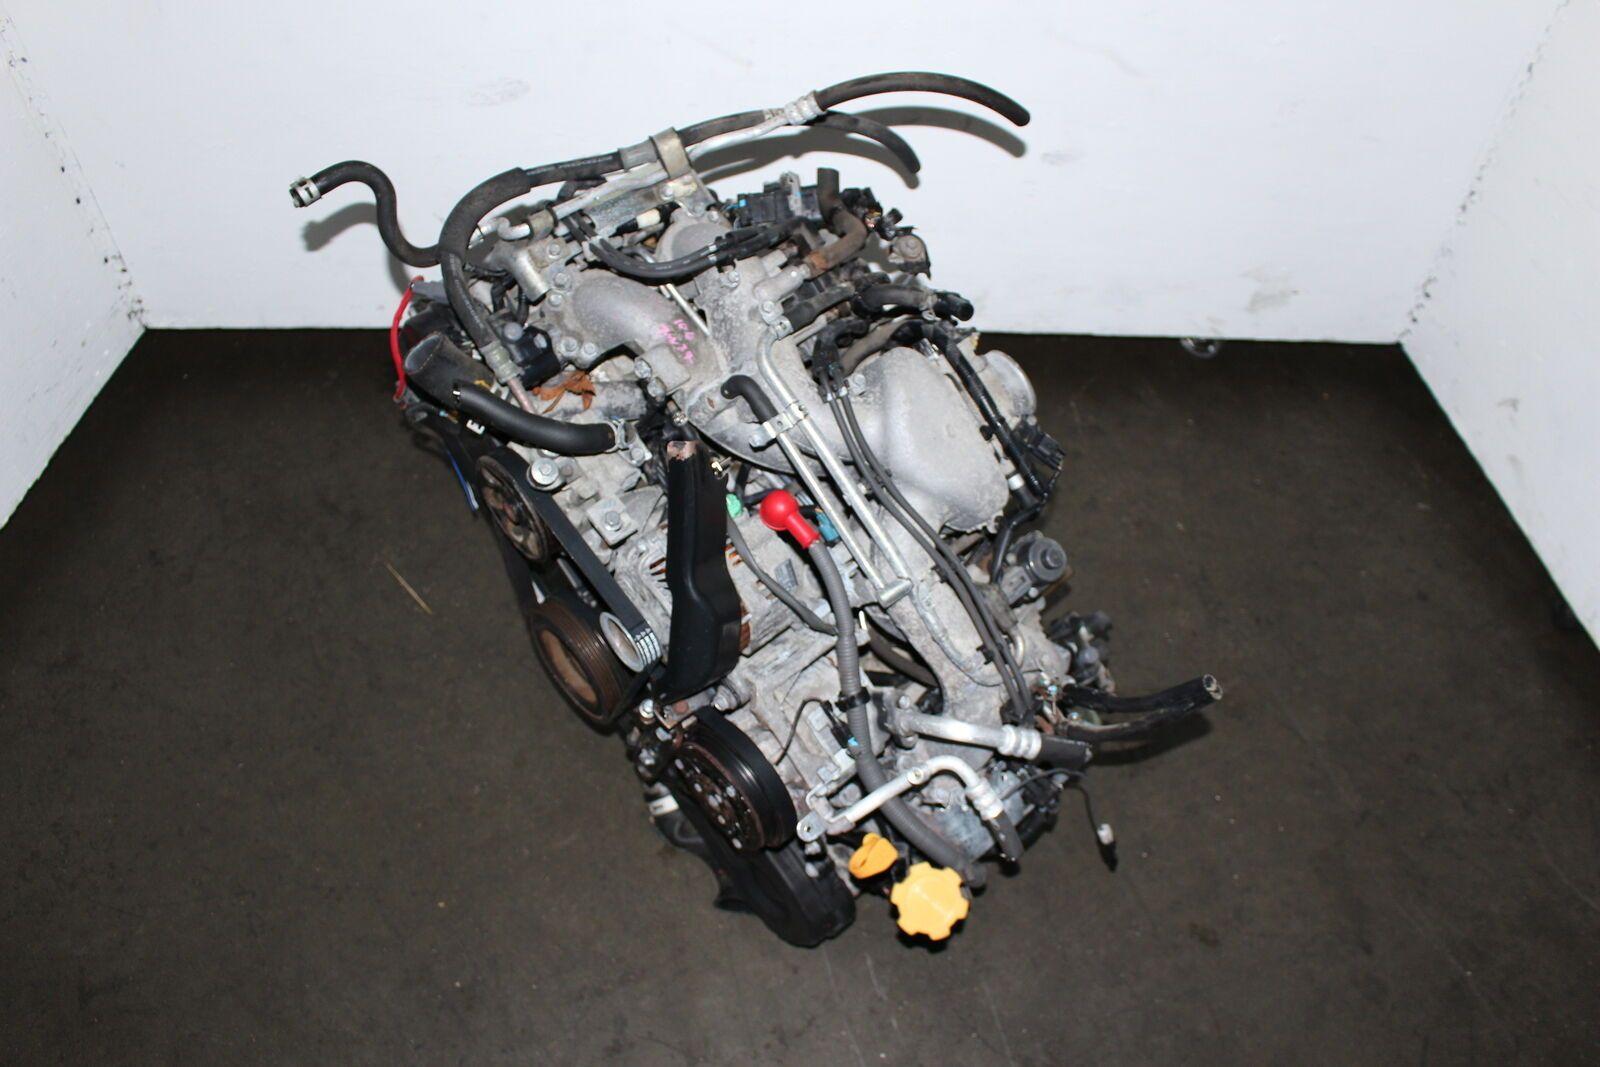 Subaru Legacy Engine In 2020 With Images Subaru Legacy Subaru Outback Subaru